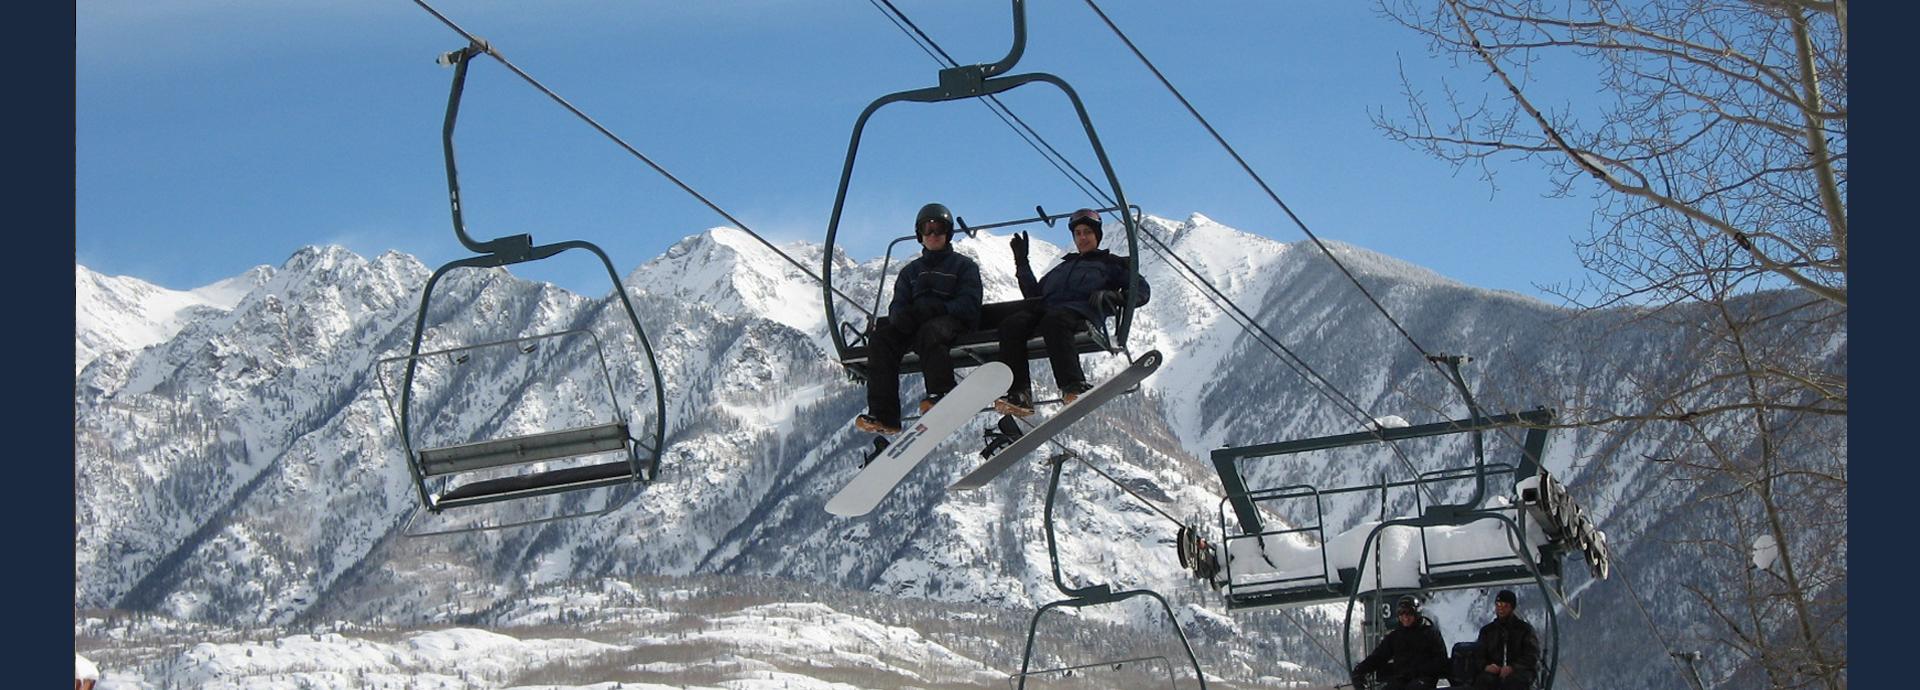 durango-skiing1